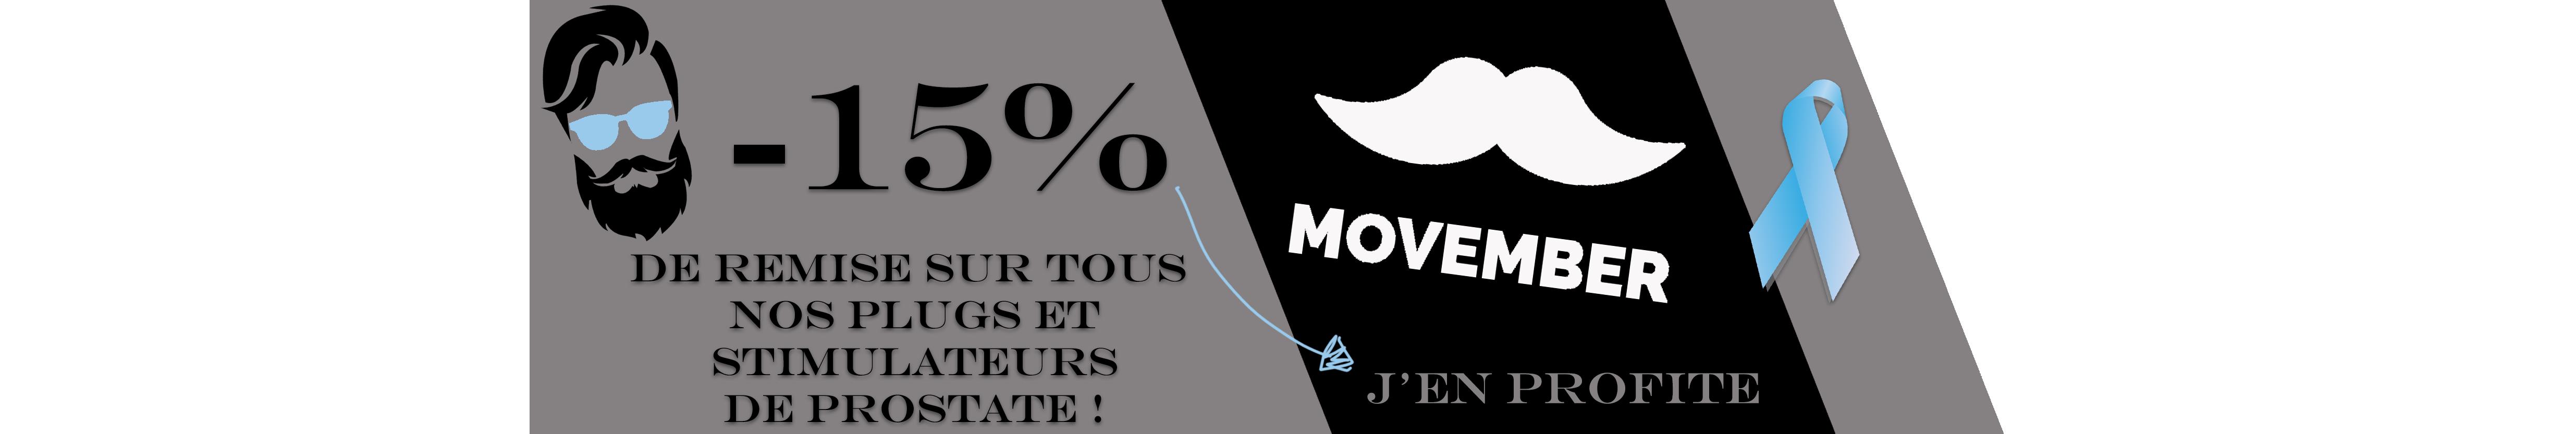 Promotion spéciale Movember